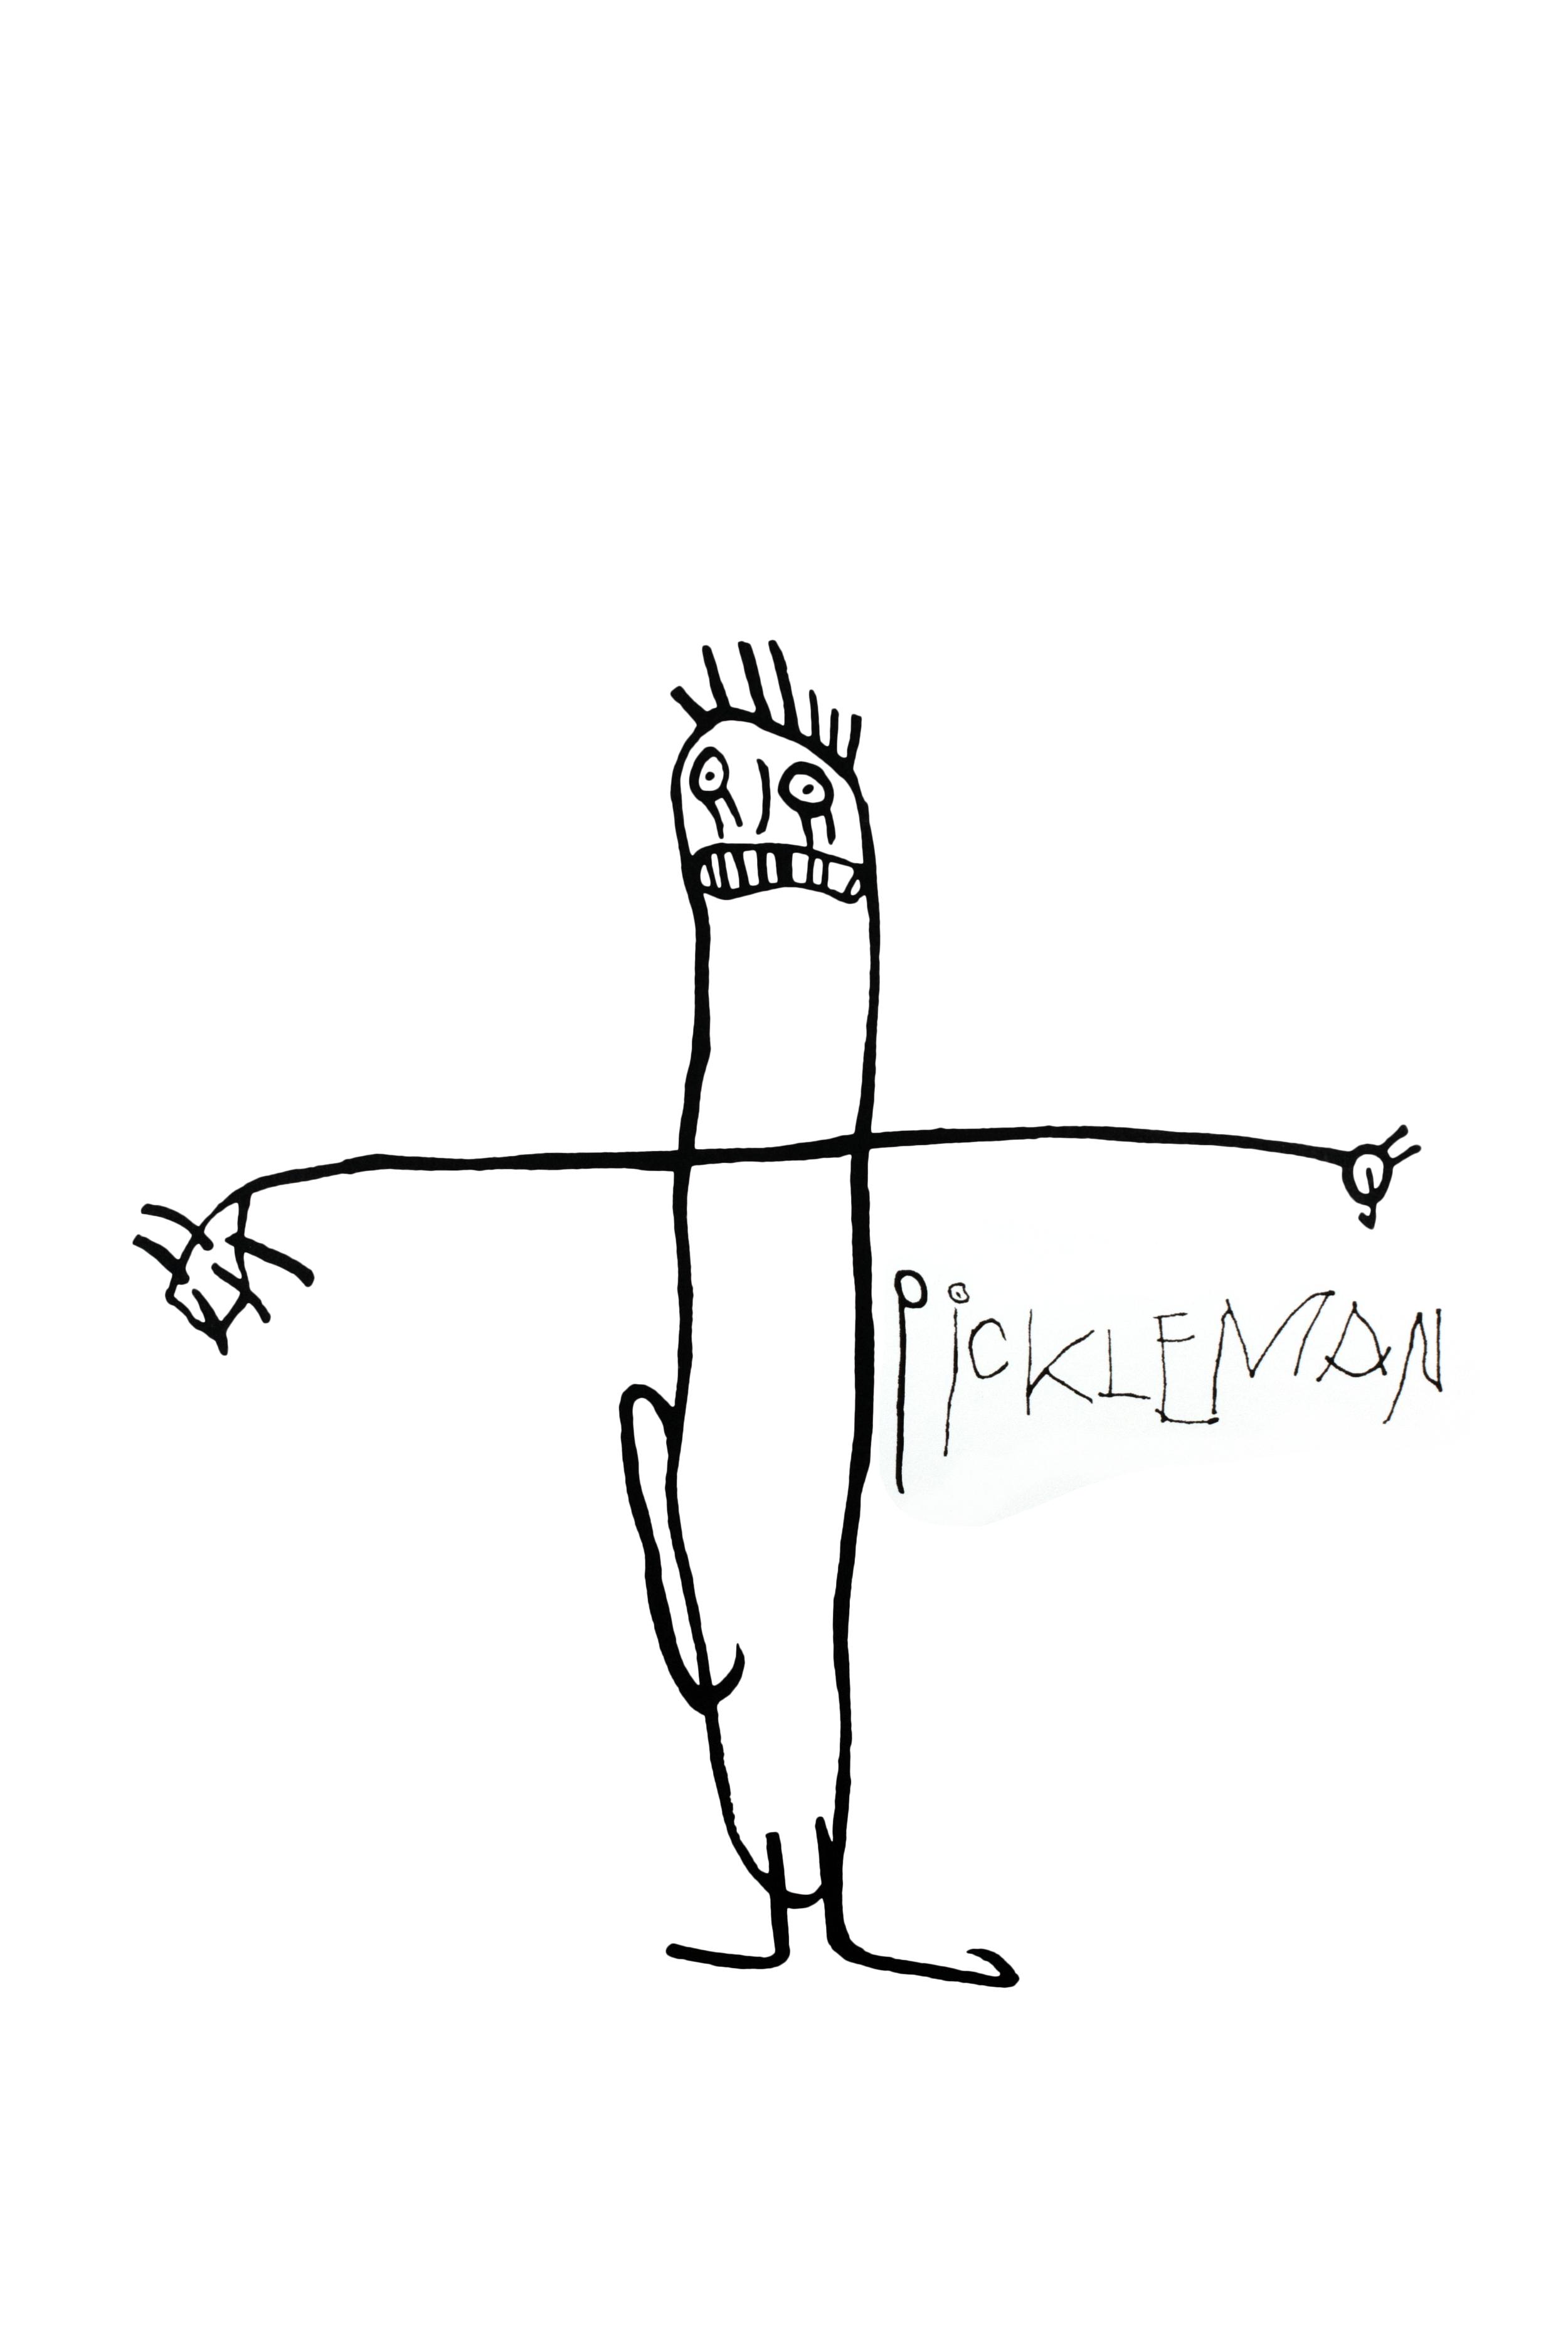 "Pickleman . 2018. Screen Print on paper. 18"" x 24""."